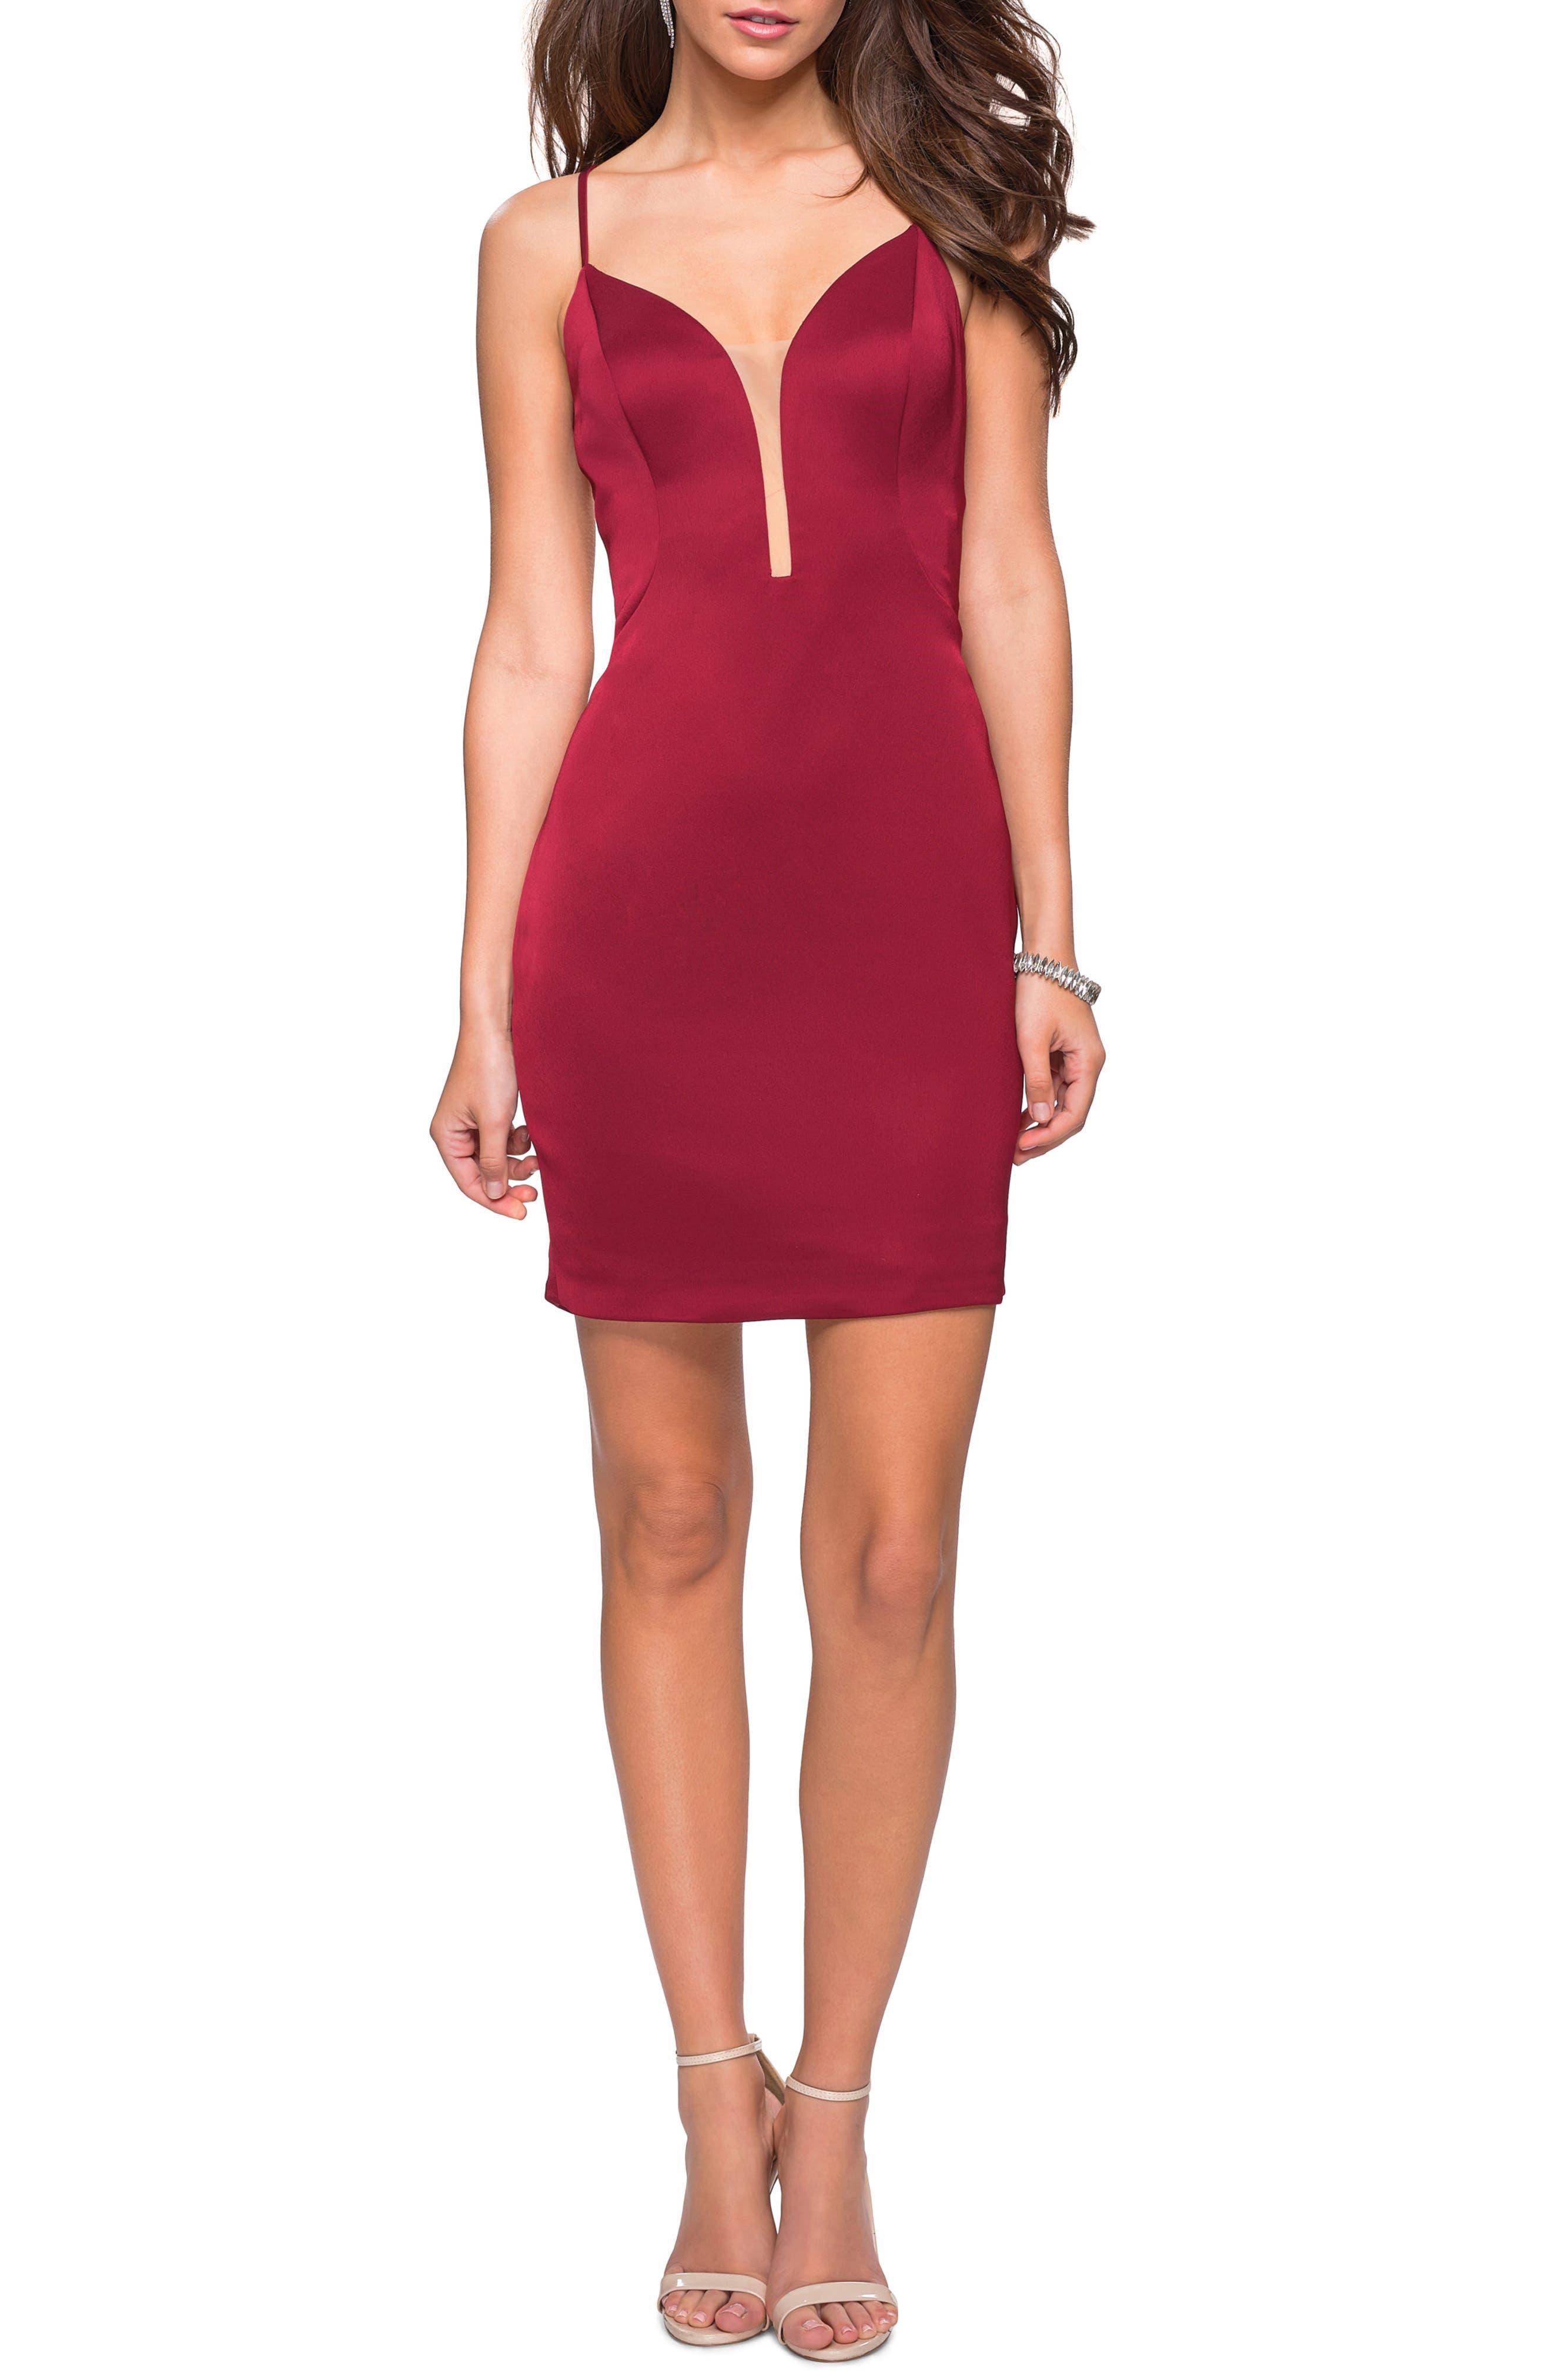 LA FEMME Strappy Back Satin Party Dress, Main, color, BURGUNDY